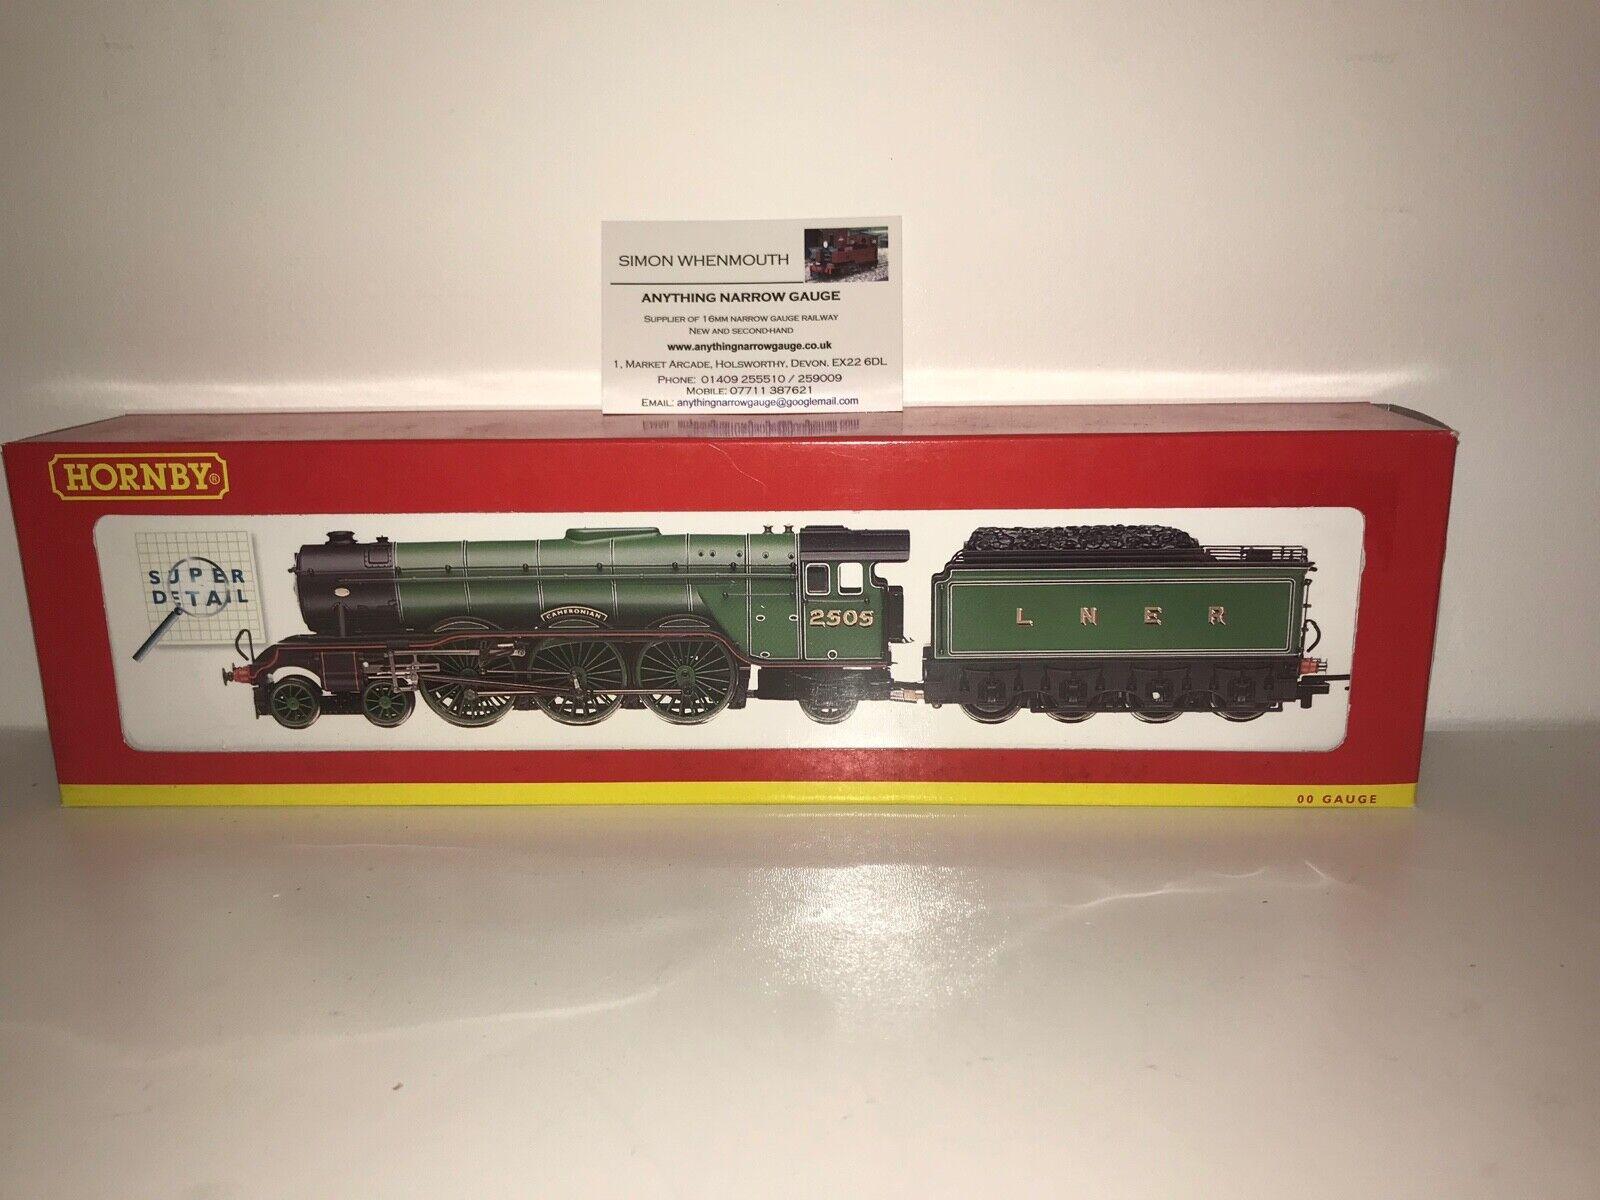 Hornby R2103 LNER LNER LNER 4-6-2 Class A3 Locomotive Cameronian d0724b